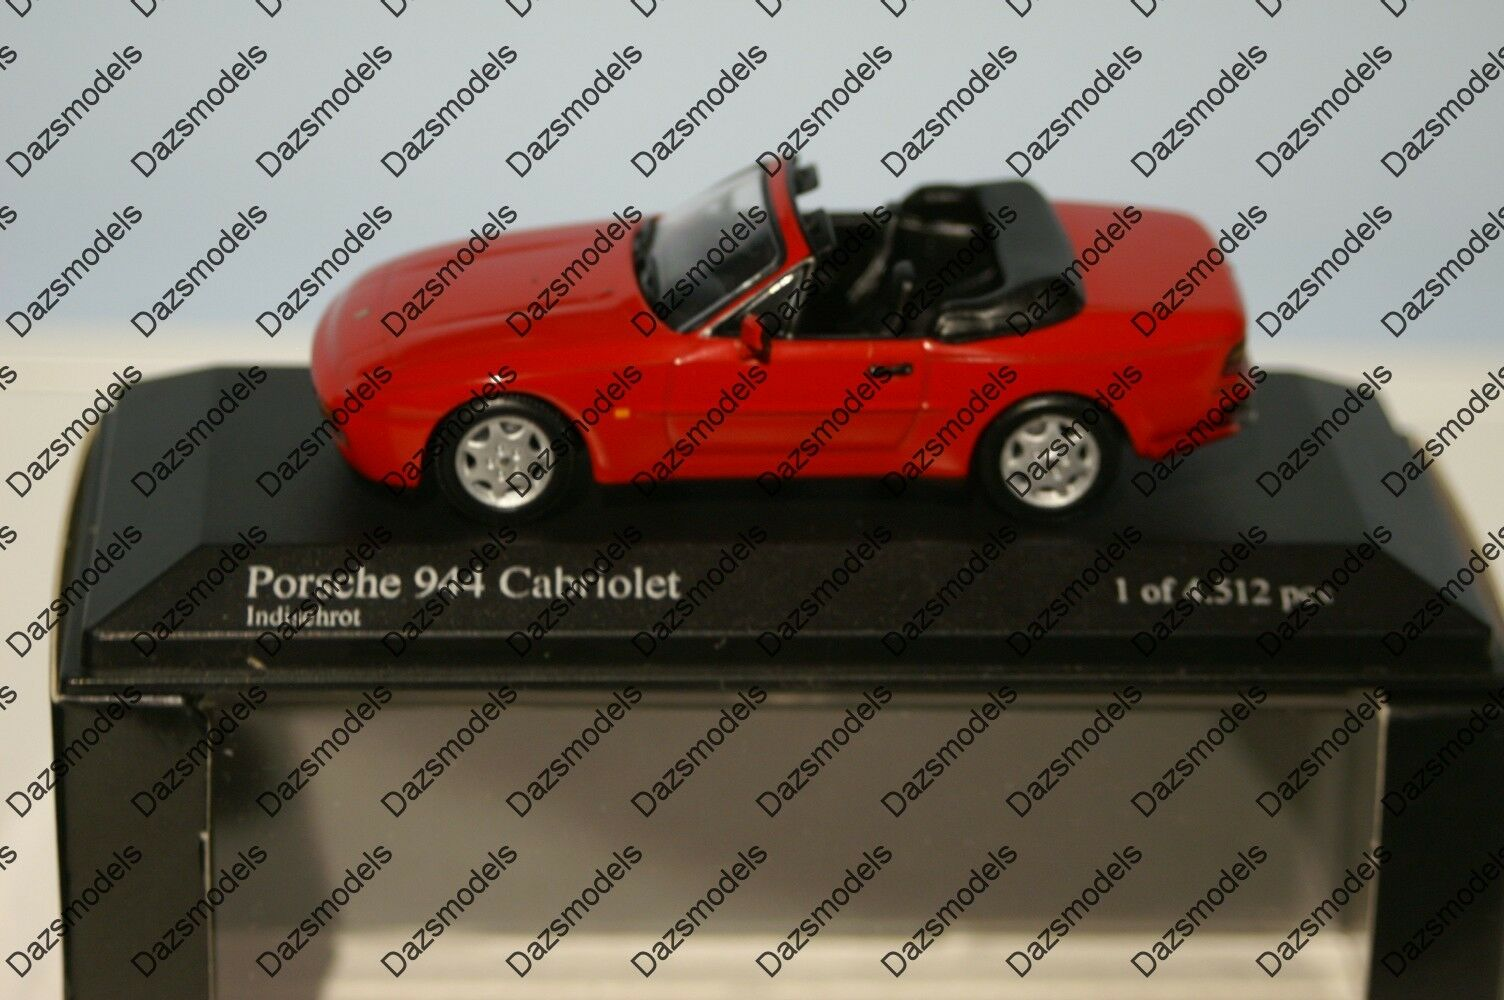 Minichamps Porsche 944 Cabriolet 1991 Red 1 43 400 062230